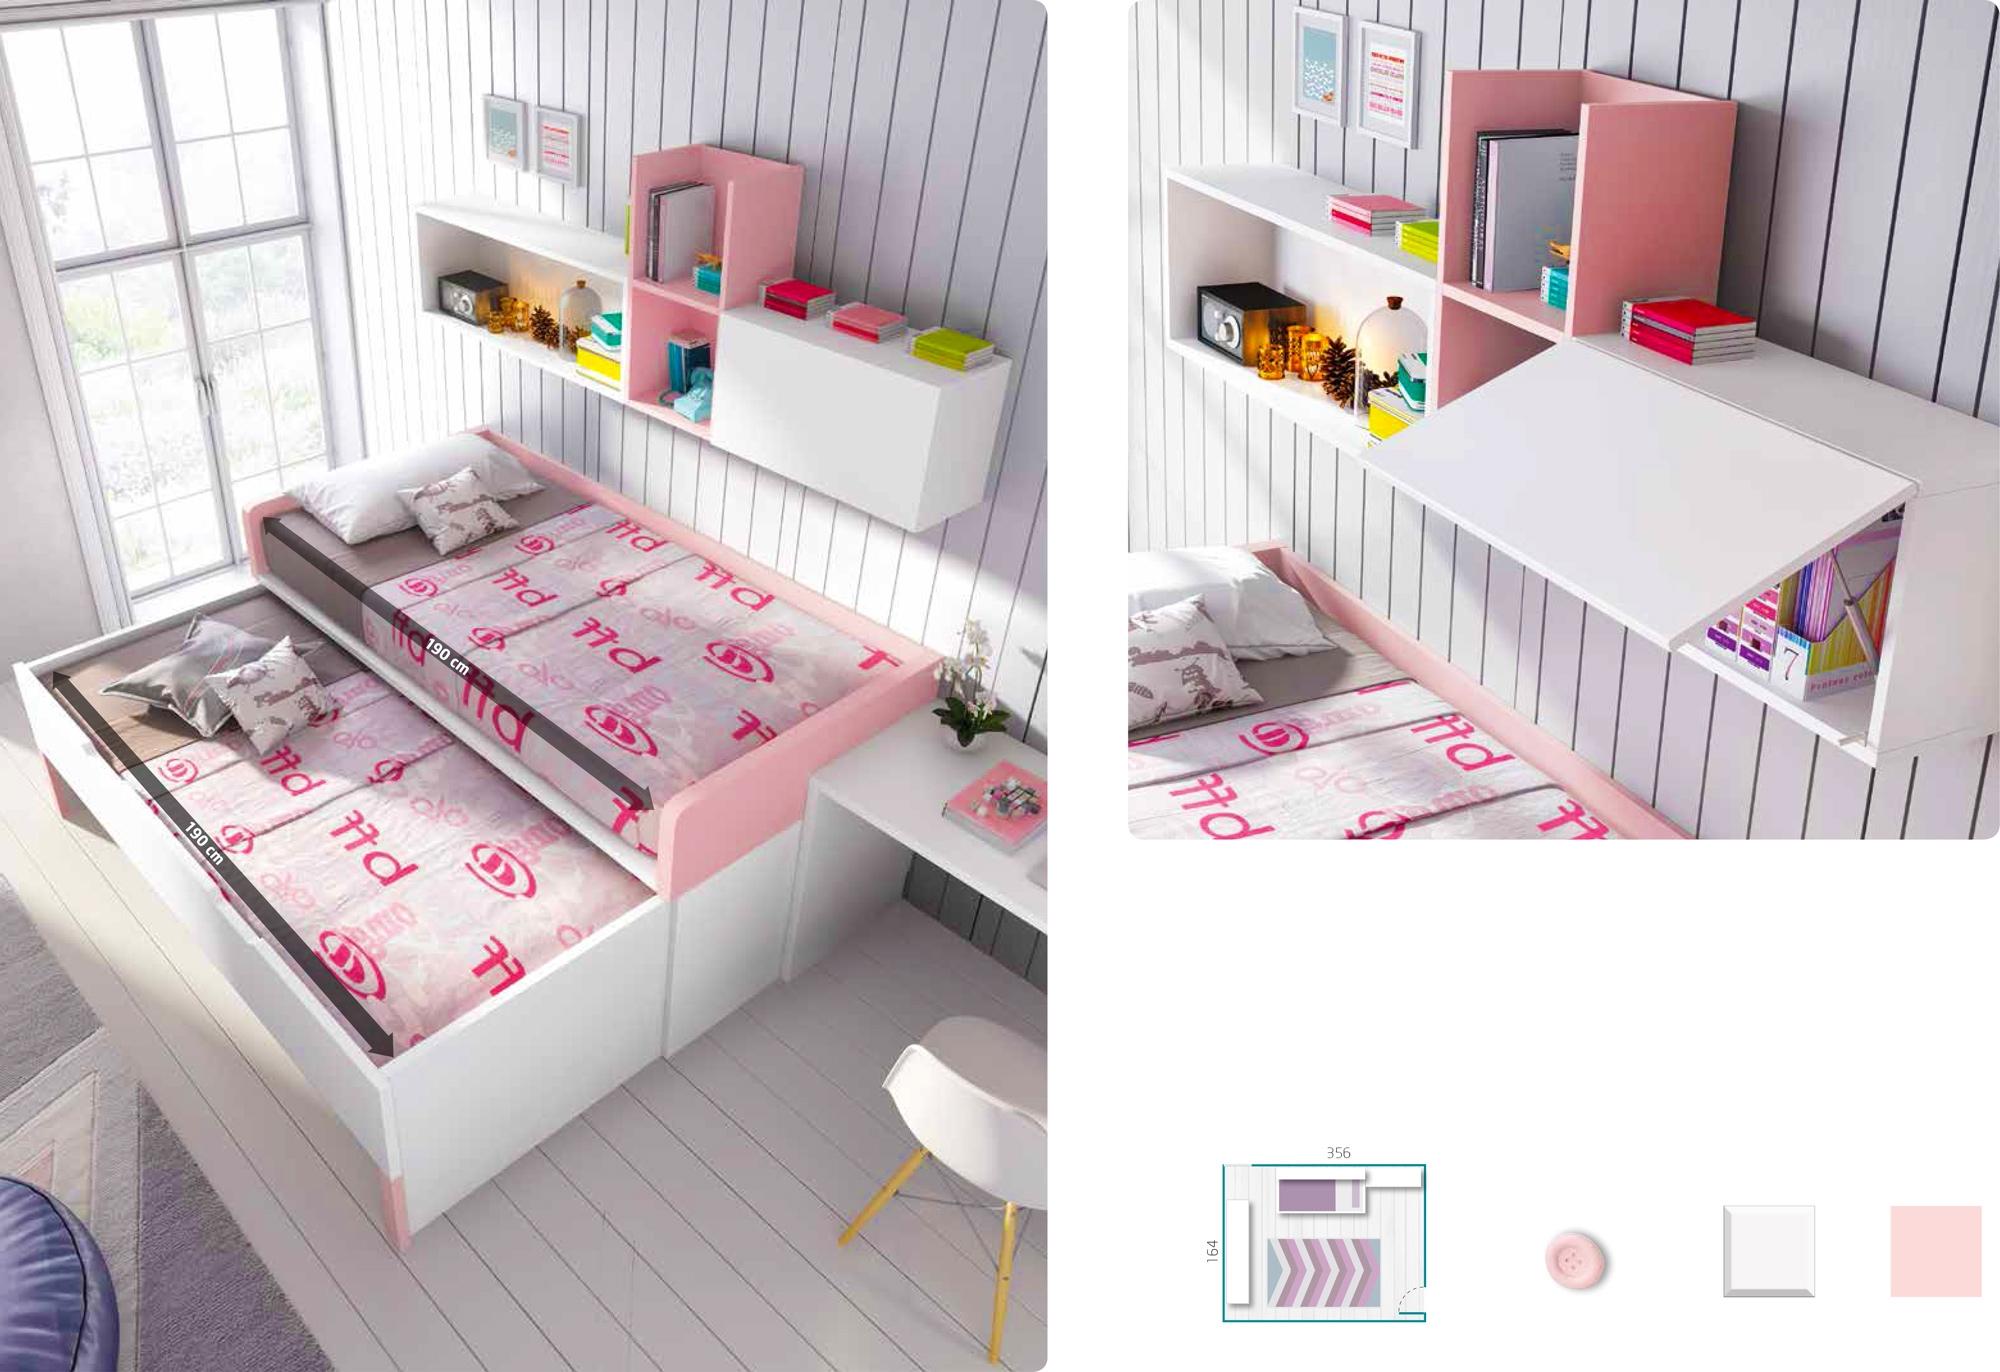 Chambre Fille Lit Gigogne : Chambre fille rose complète à personnaliser girly